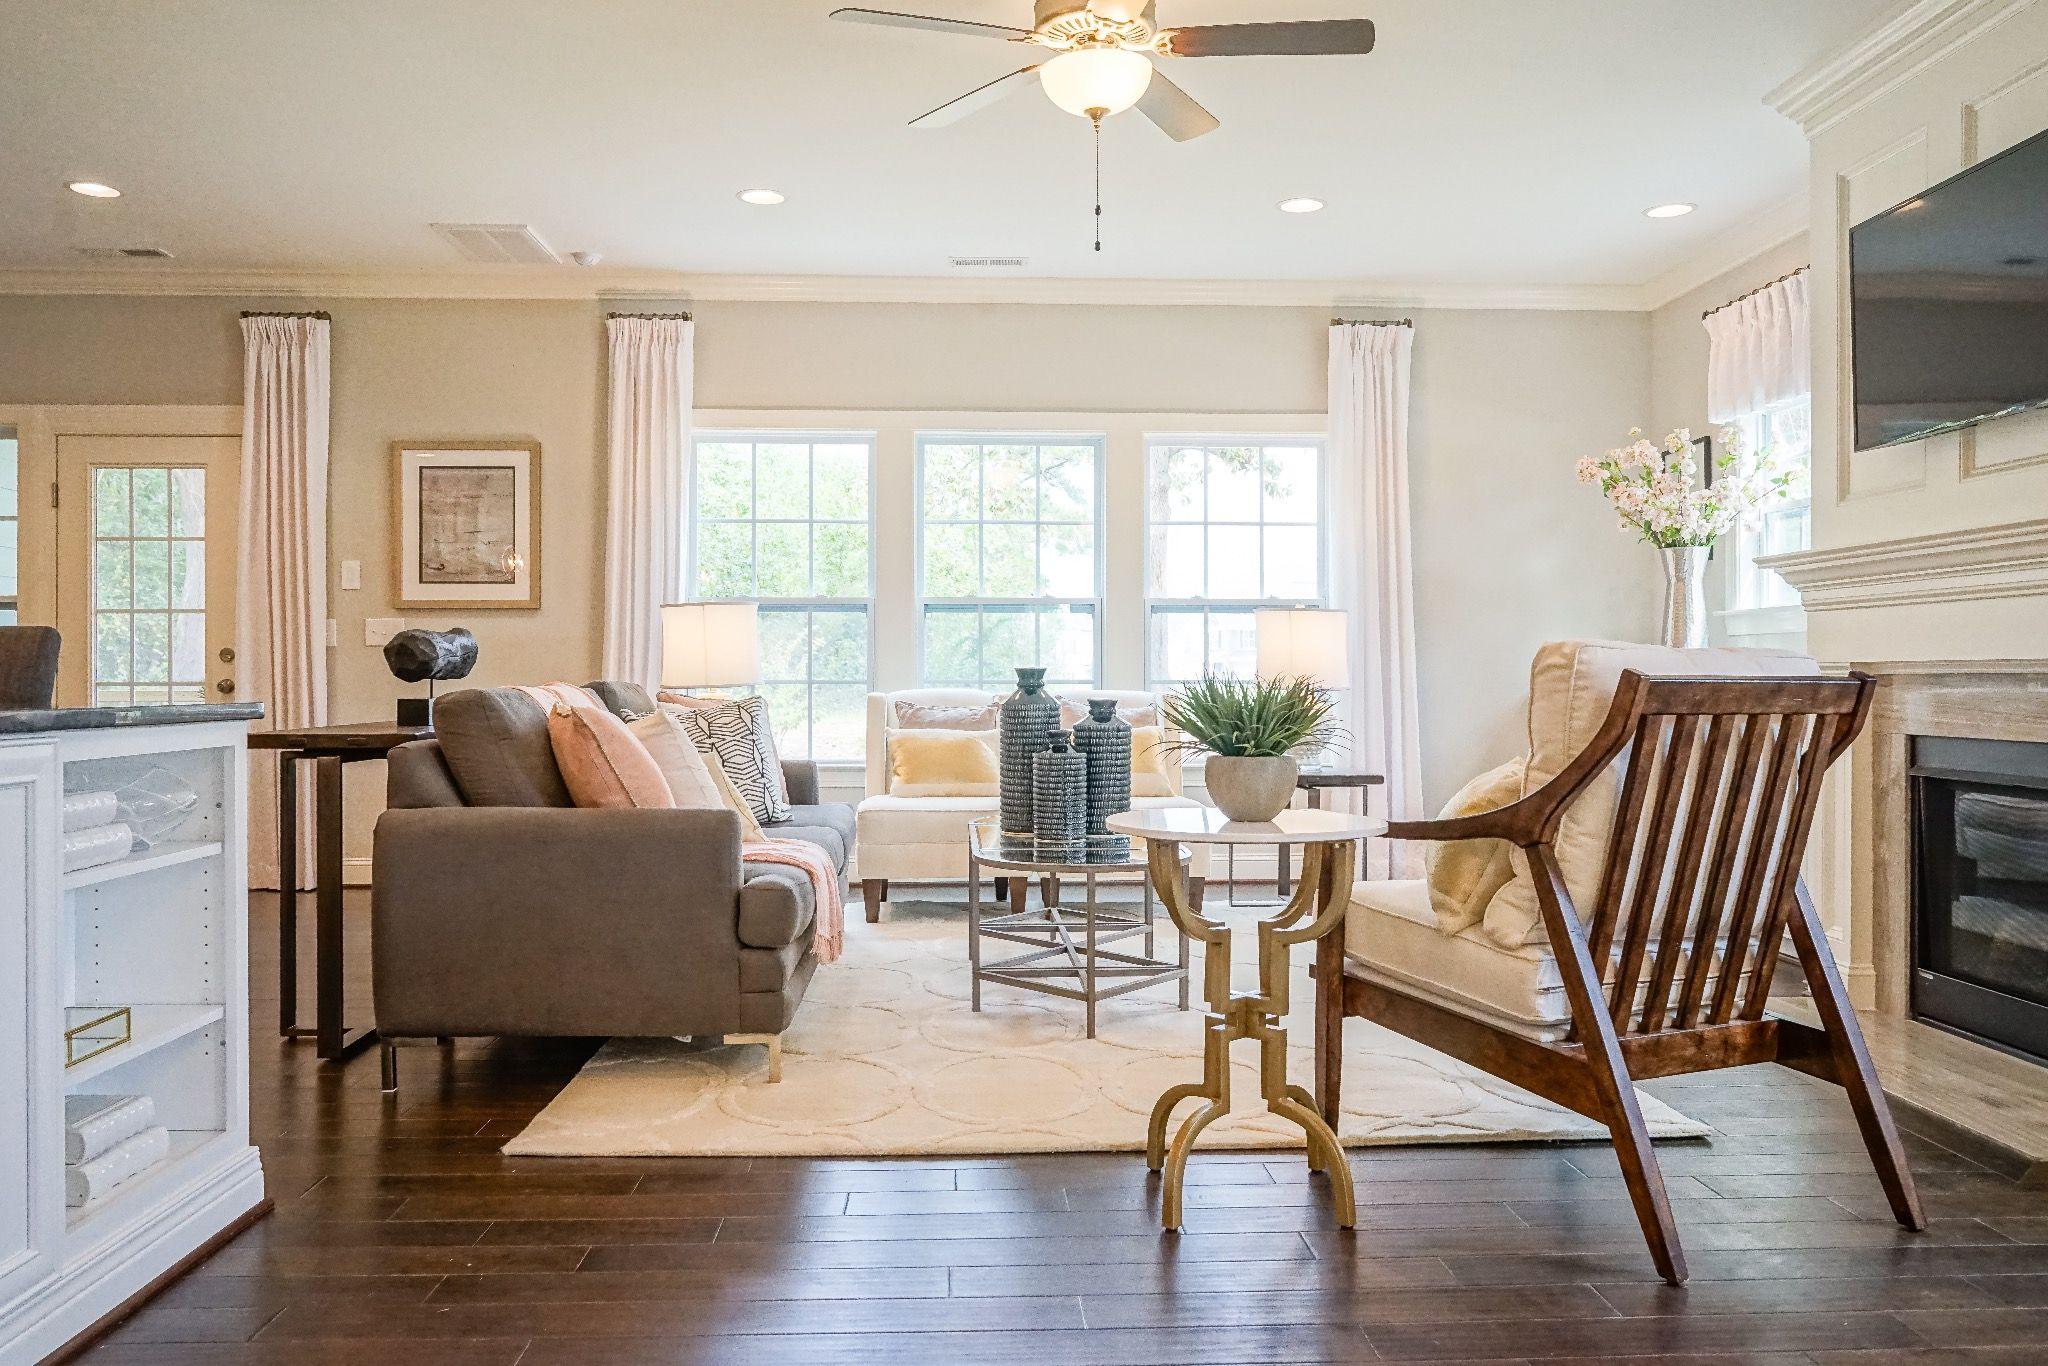 Royal Oaks Raleigh-Durham-Chapel Hill NC Communities & Homes for ...